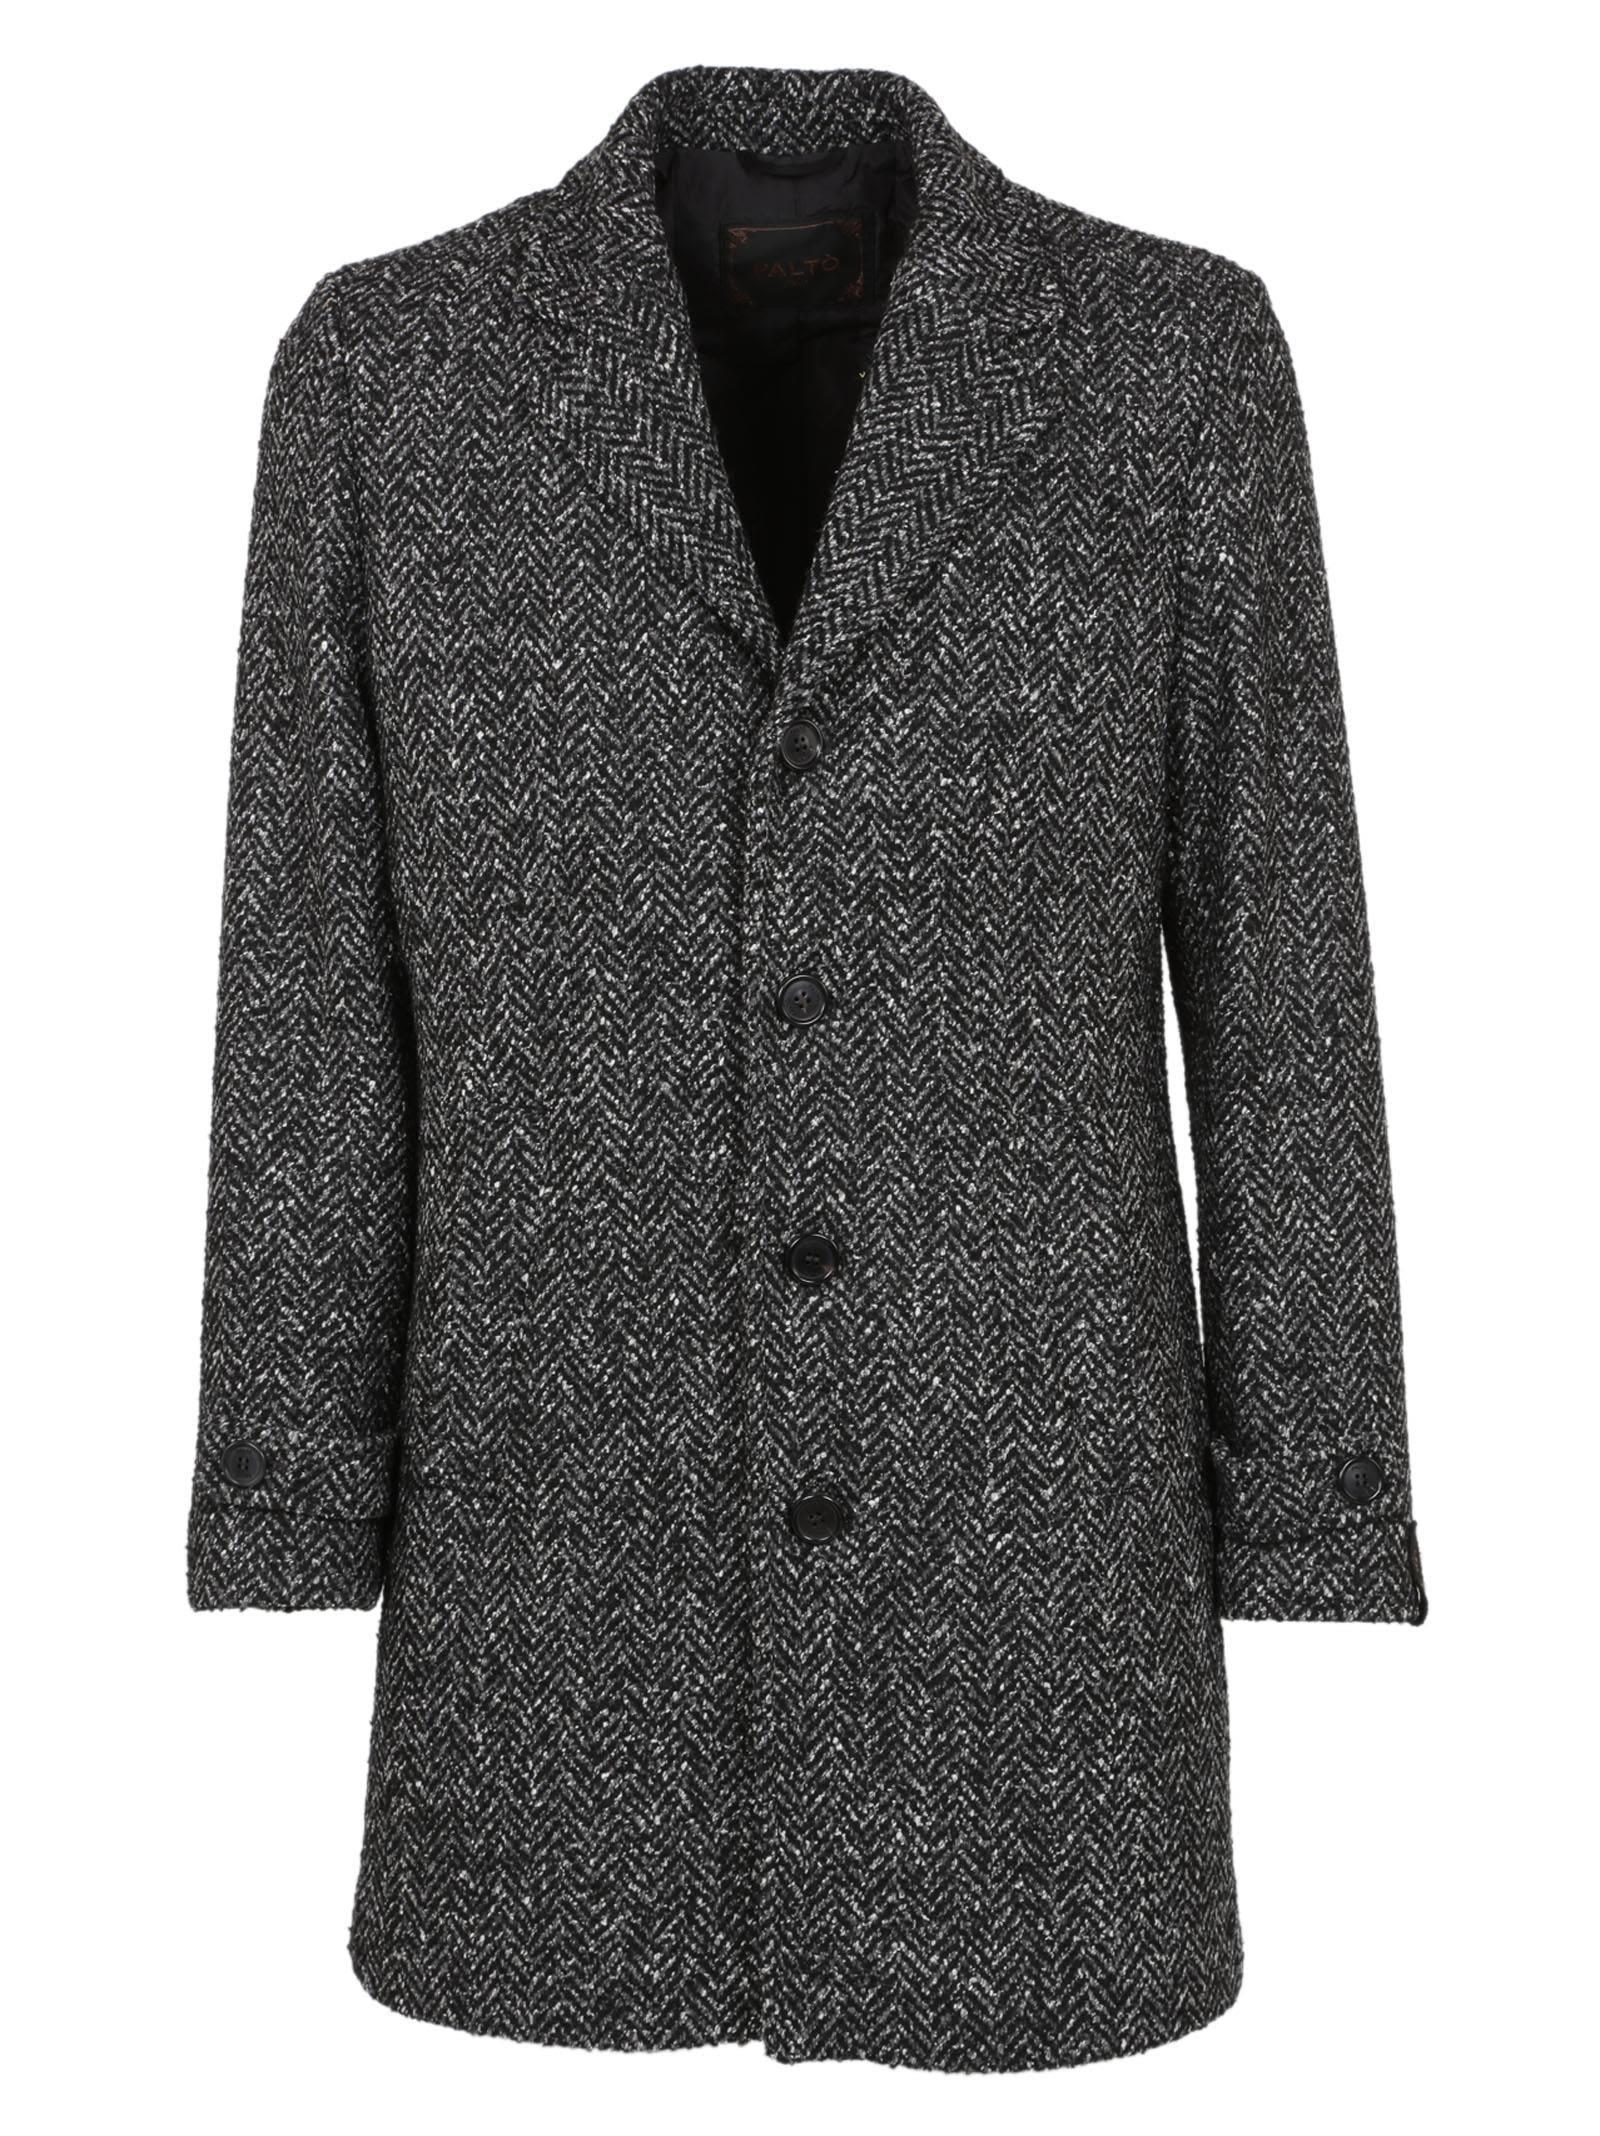 Palto Patterned Coat